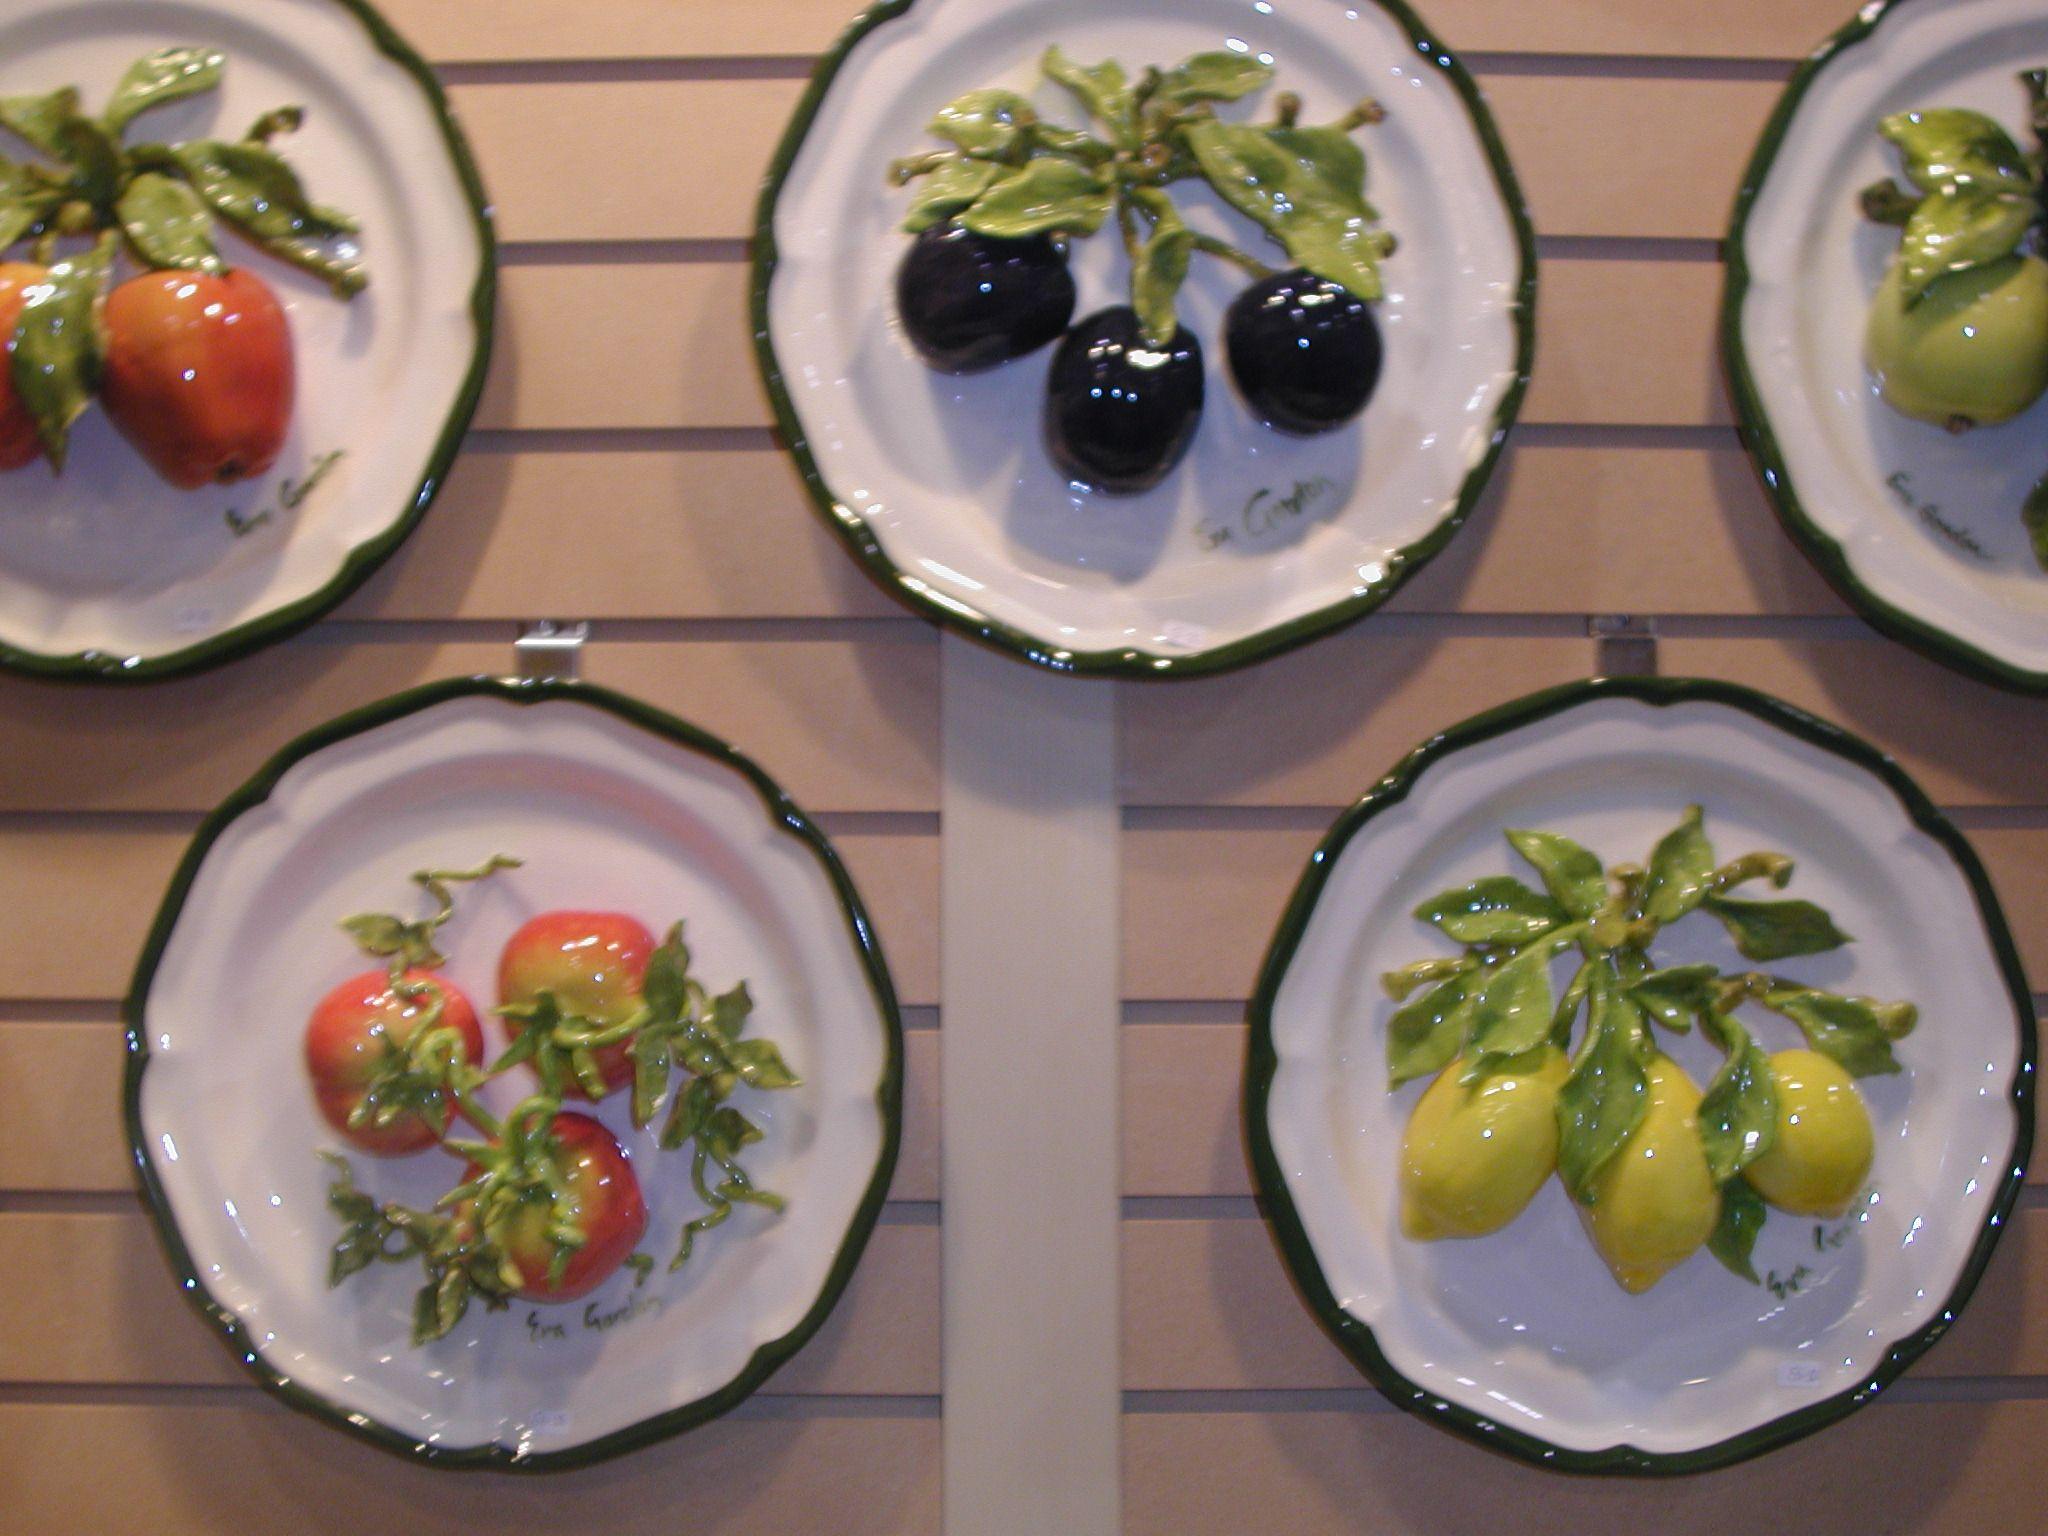 Elements For Good Living Protocol Gifts Porcelain Flowers Ceramic Painting Porcelain Ceramics